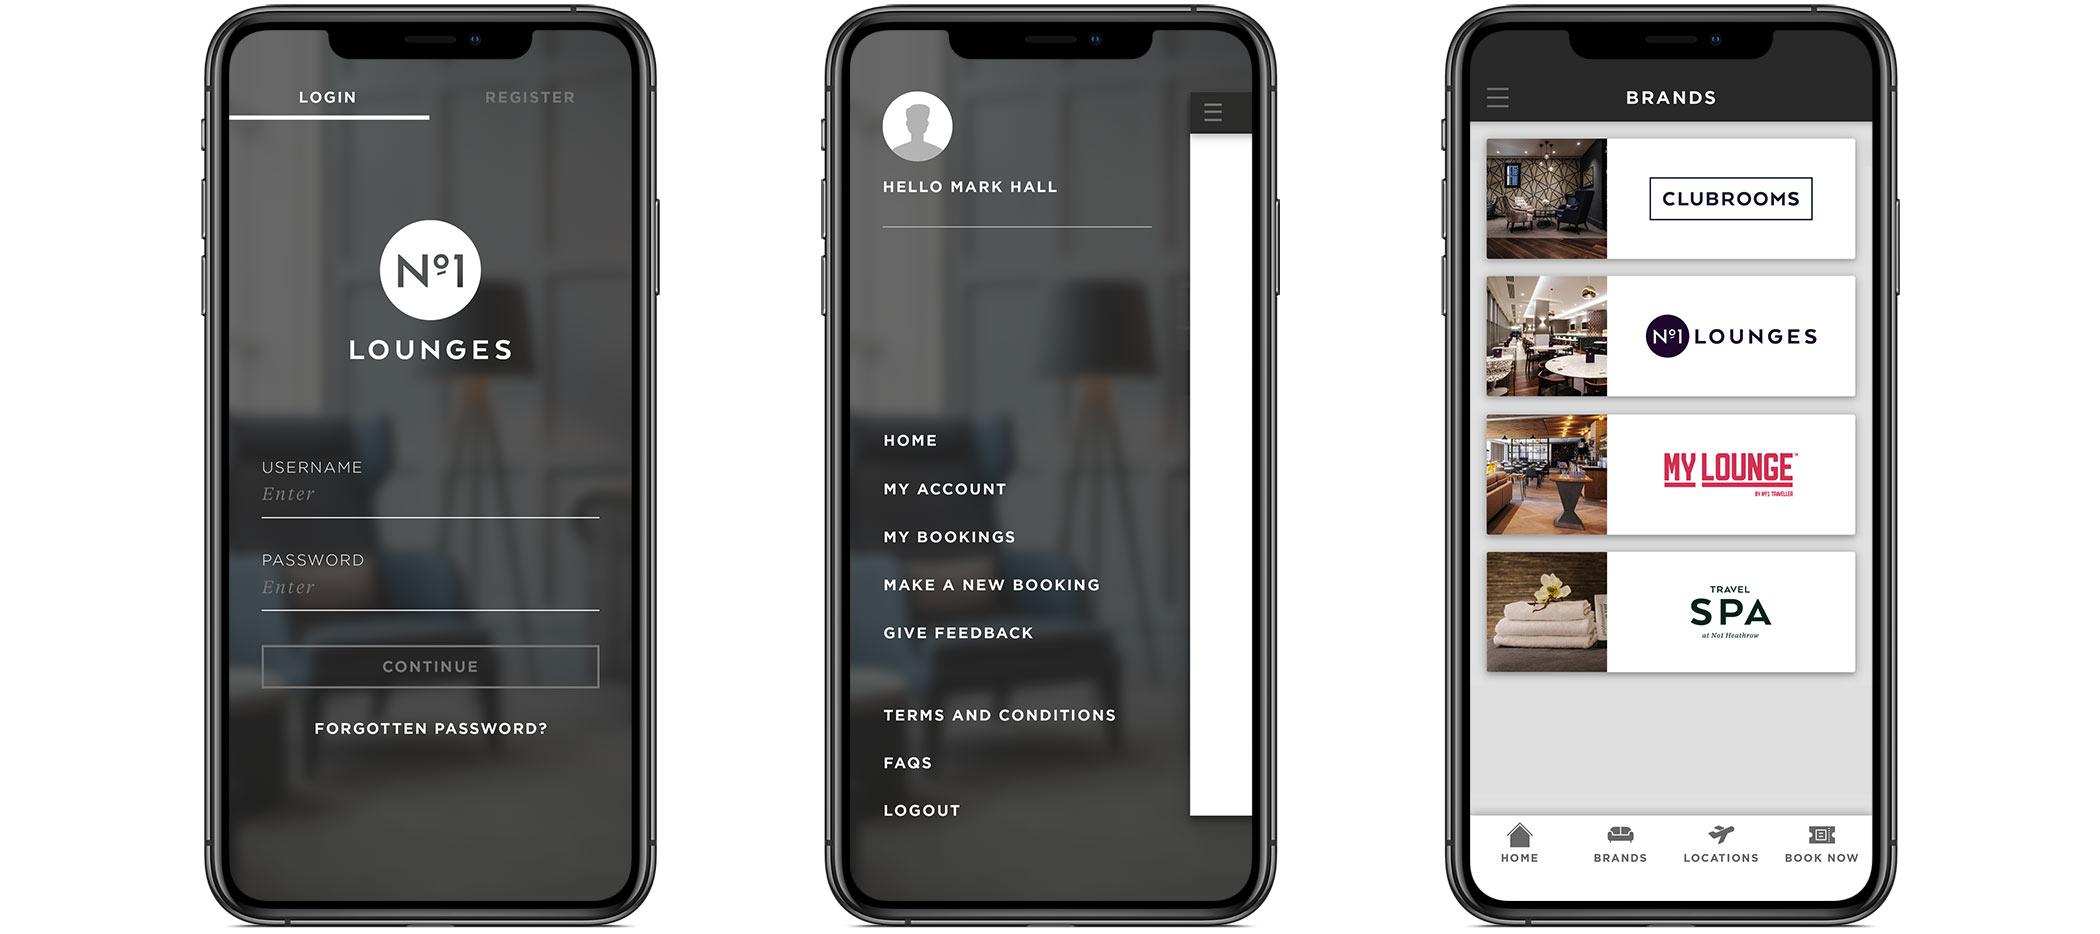 Native app design on iPhone X